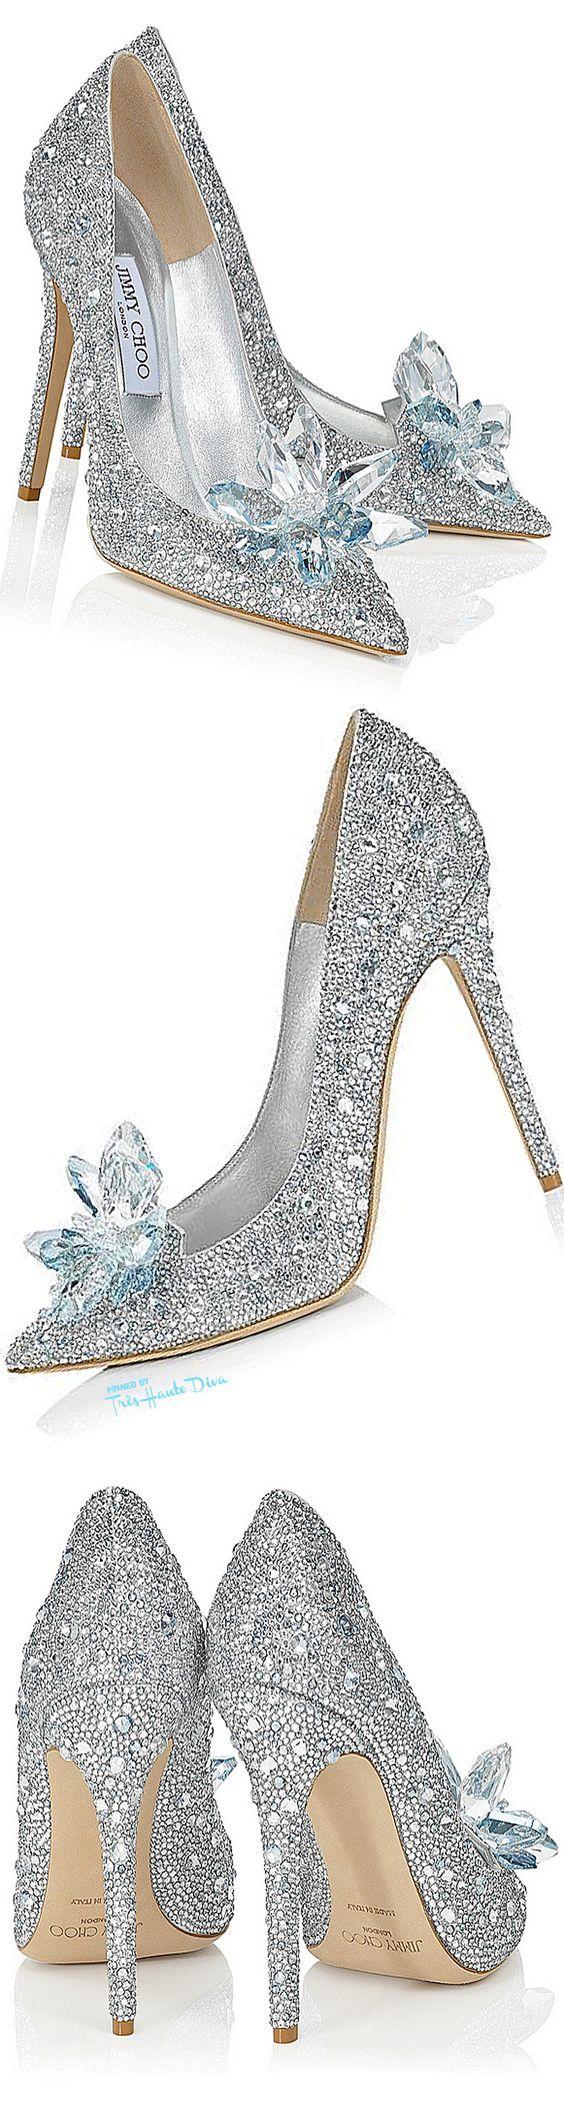 Sparkly silver Cinderella heels (Jimmy Choo)